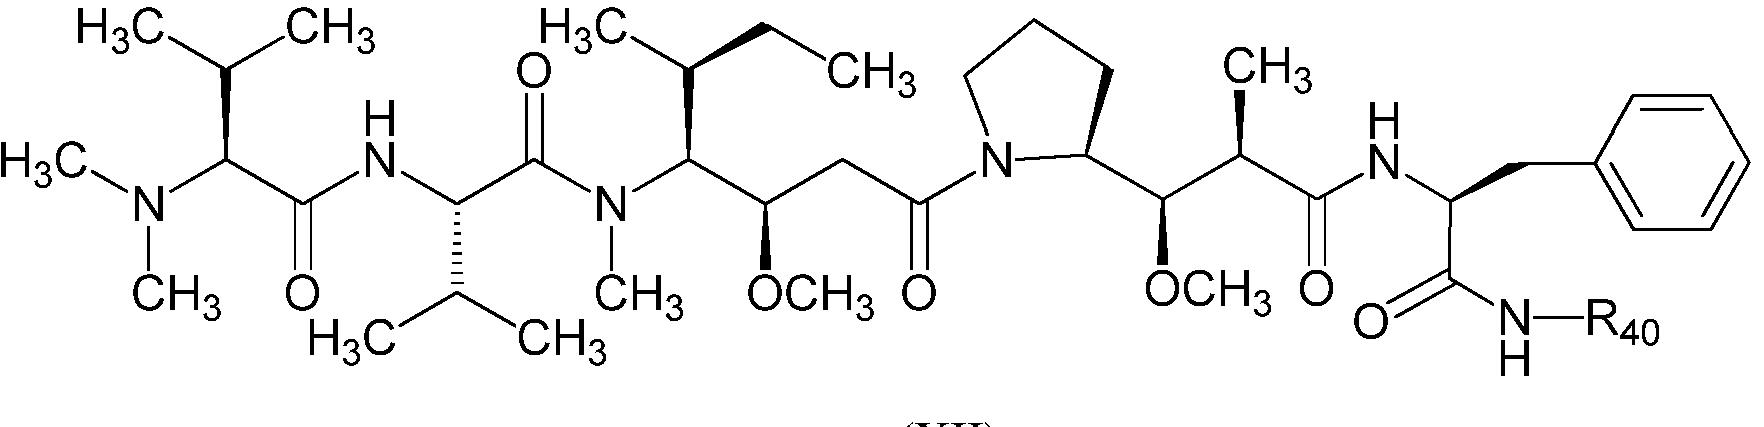 Figure 112014001971018-pct00116